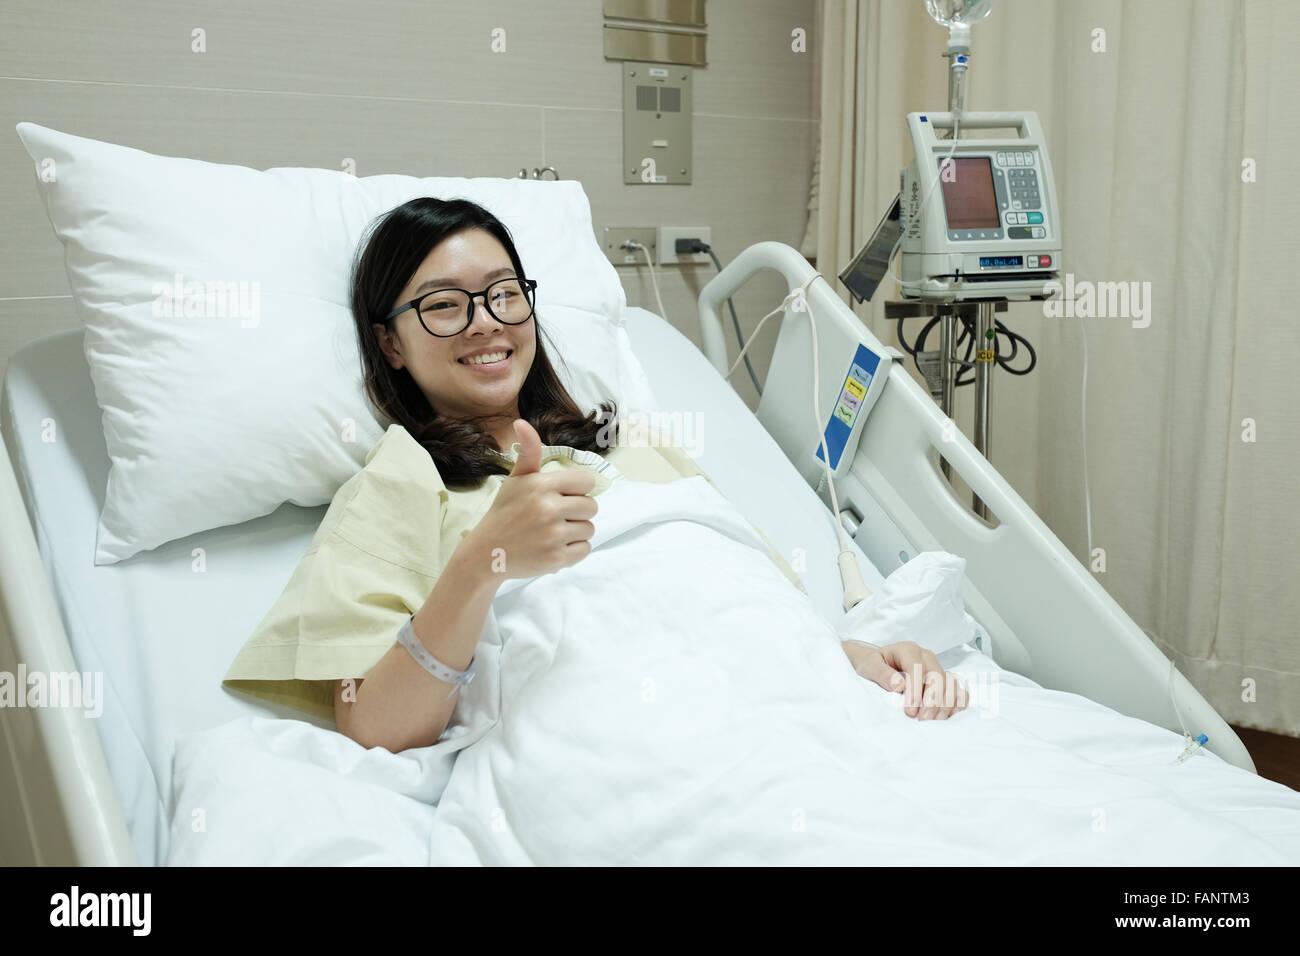 Vids girl in a hospital